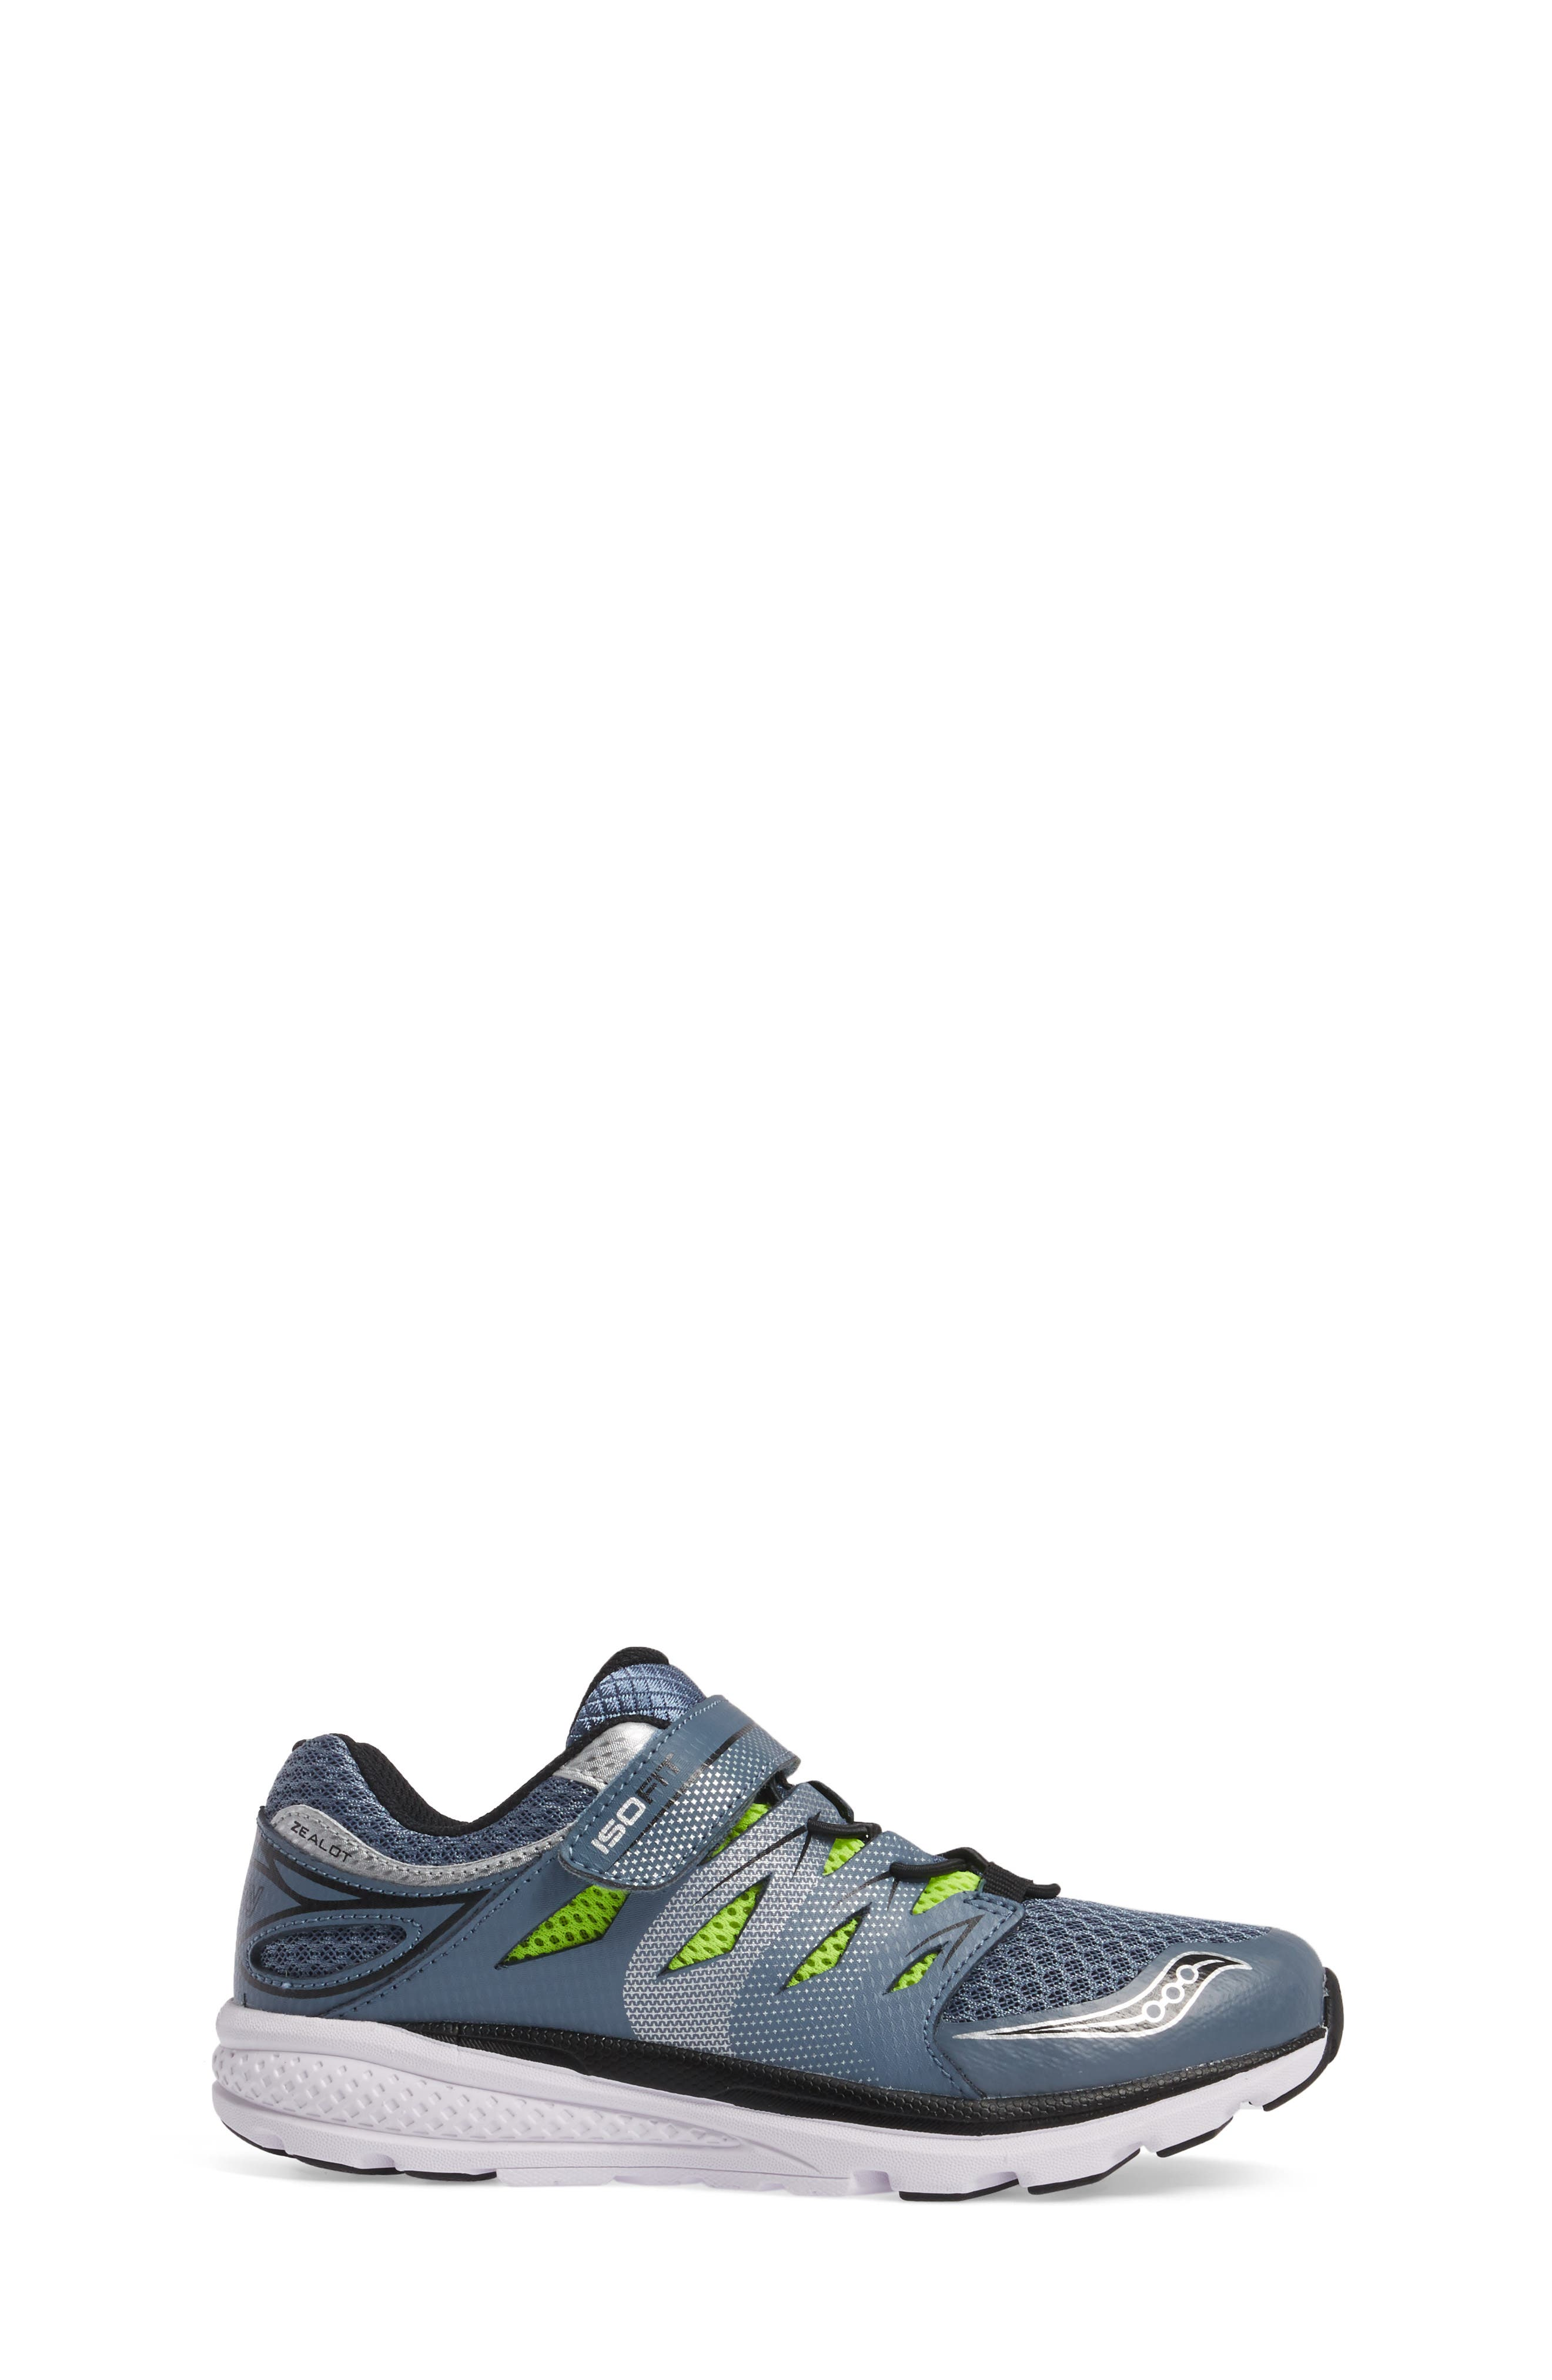 Alternate Image 3  - Saucony 'Zealot 2 AC' Running Shoe (Toddler & Little Kid)